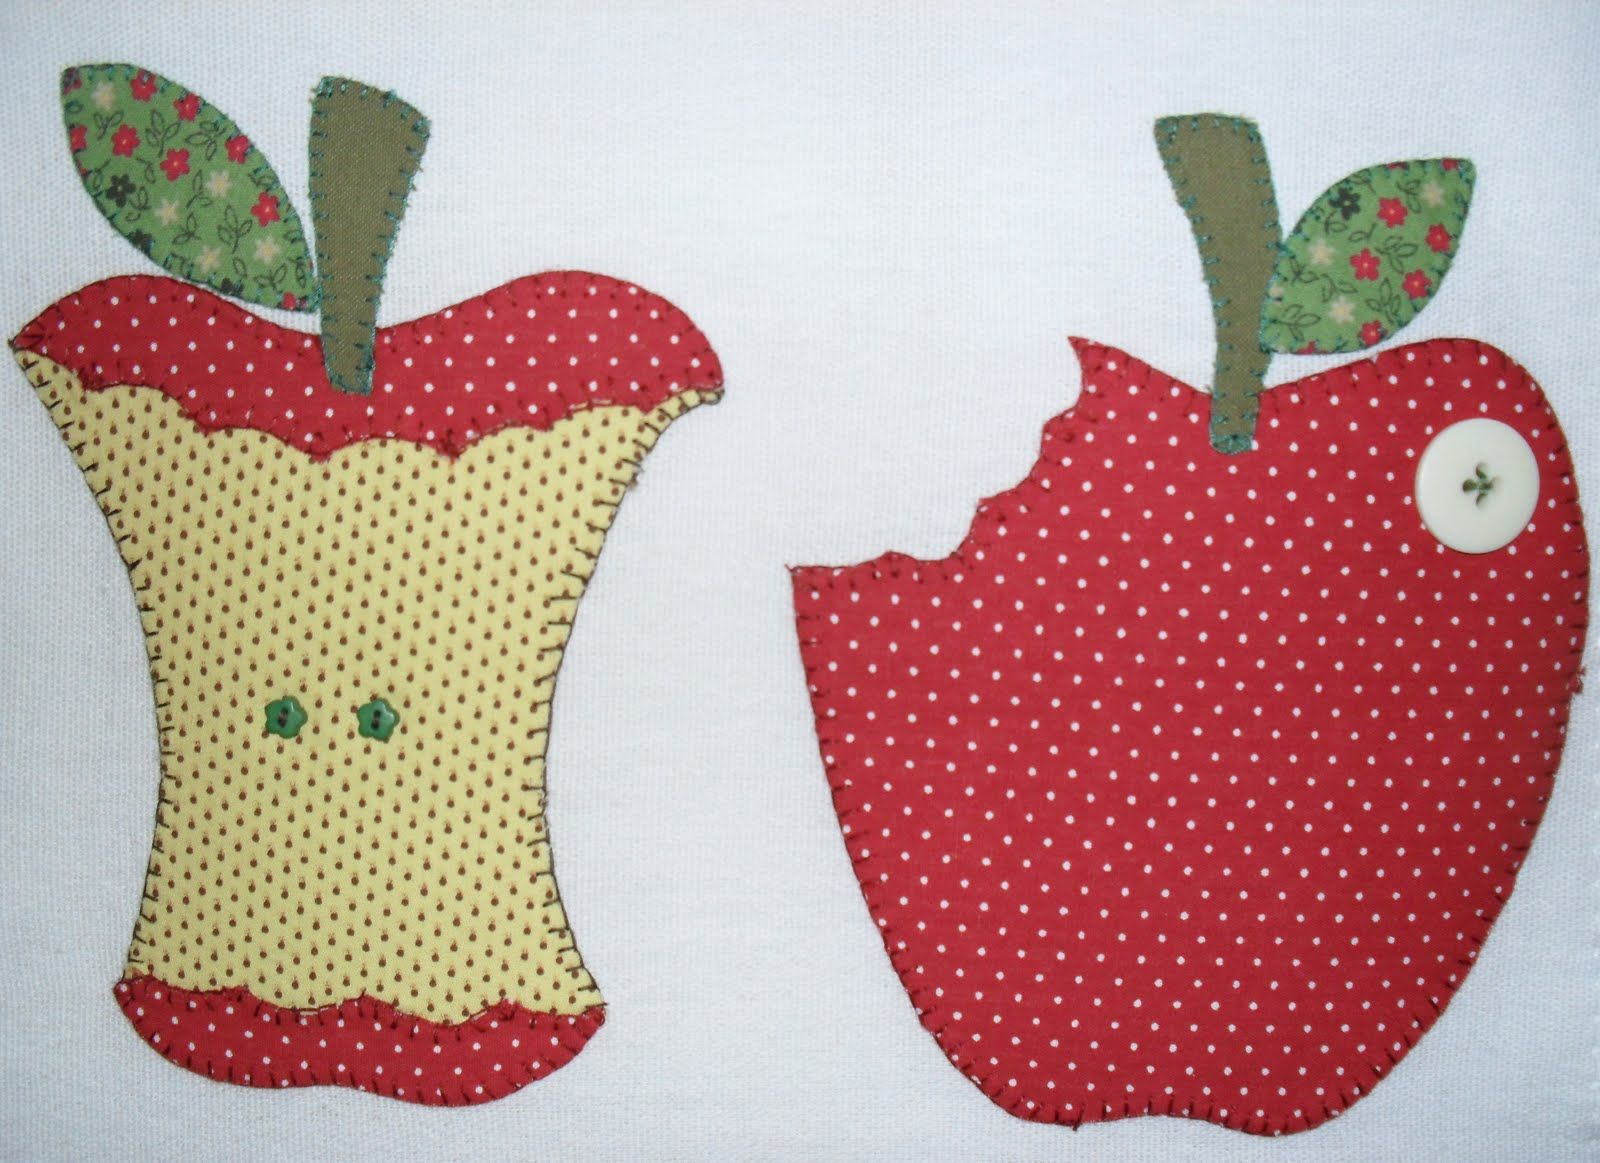 moldes patch aplique - Buscar con Google   Embroidery   Pinterest ...